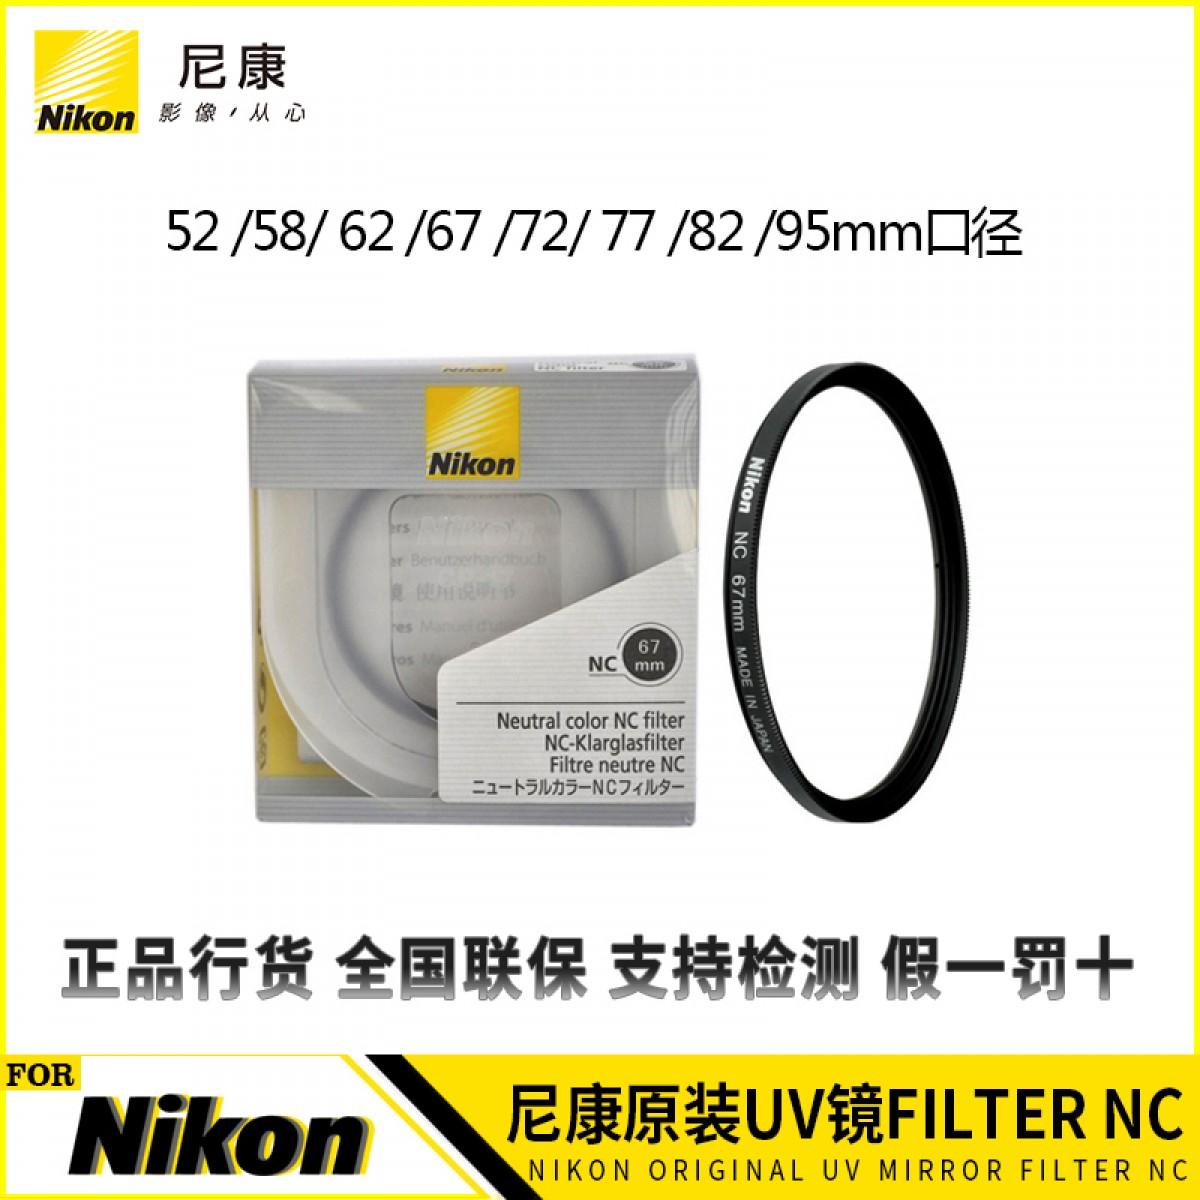 Nikon/尼康原装UV镜NC滤镜保护镜 52 55 58 67 77 82mm口径